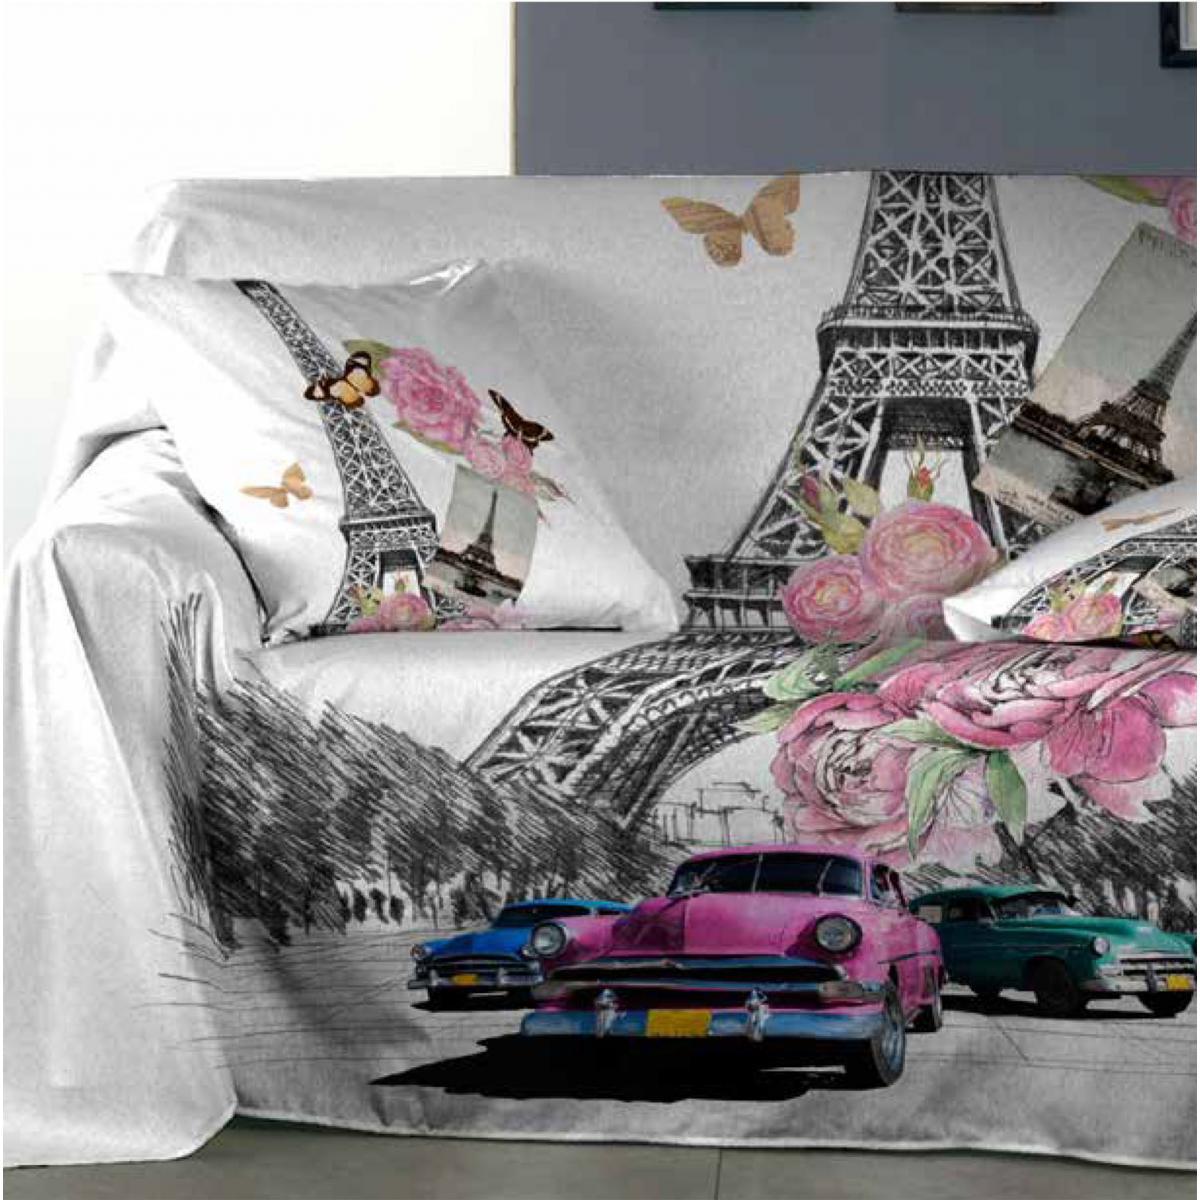 Foulard Para sofas 8ydm Foulard sofà Glamour Purpura Home